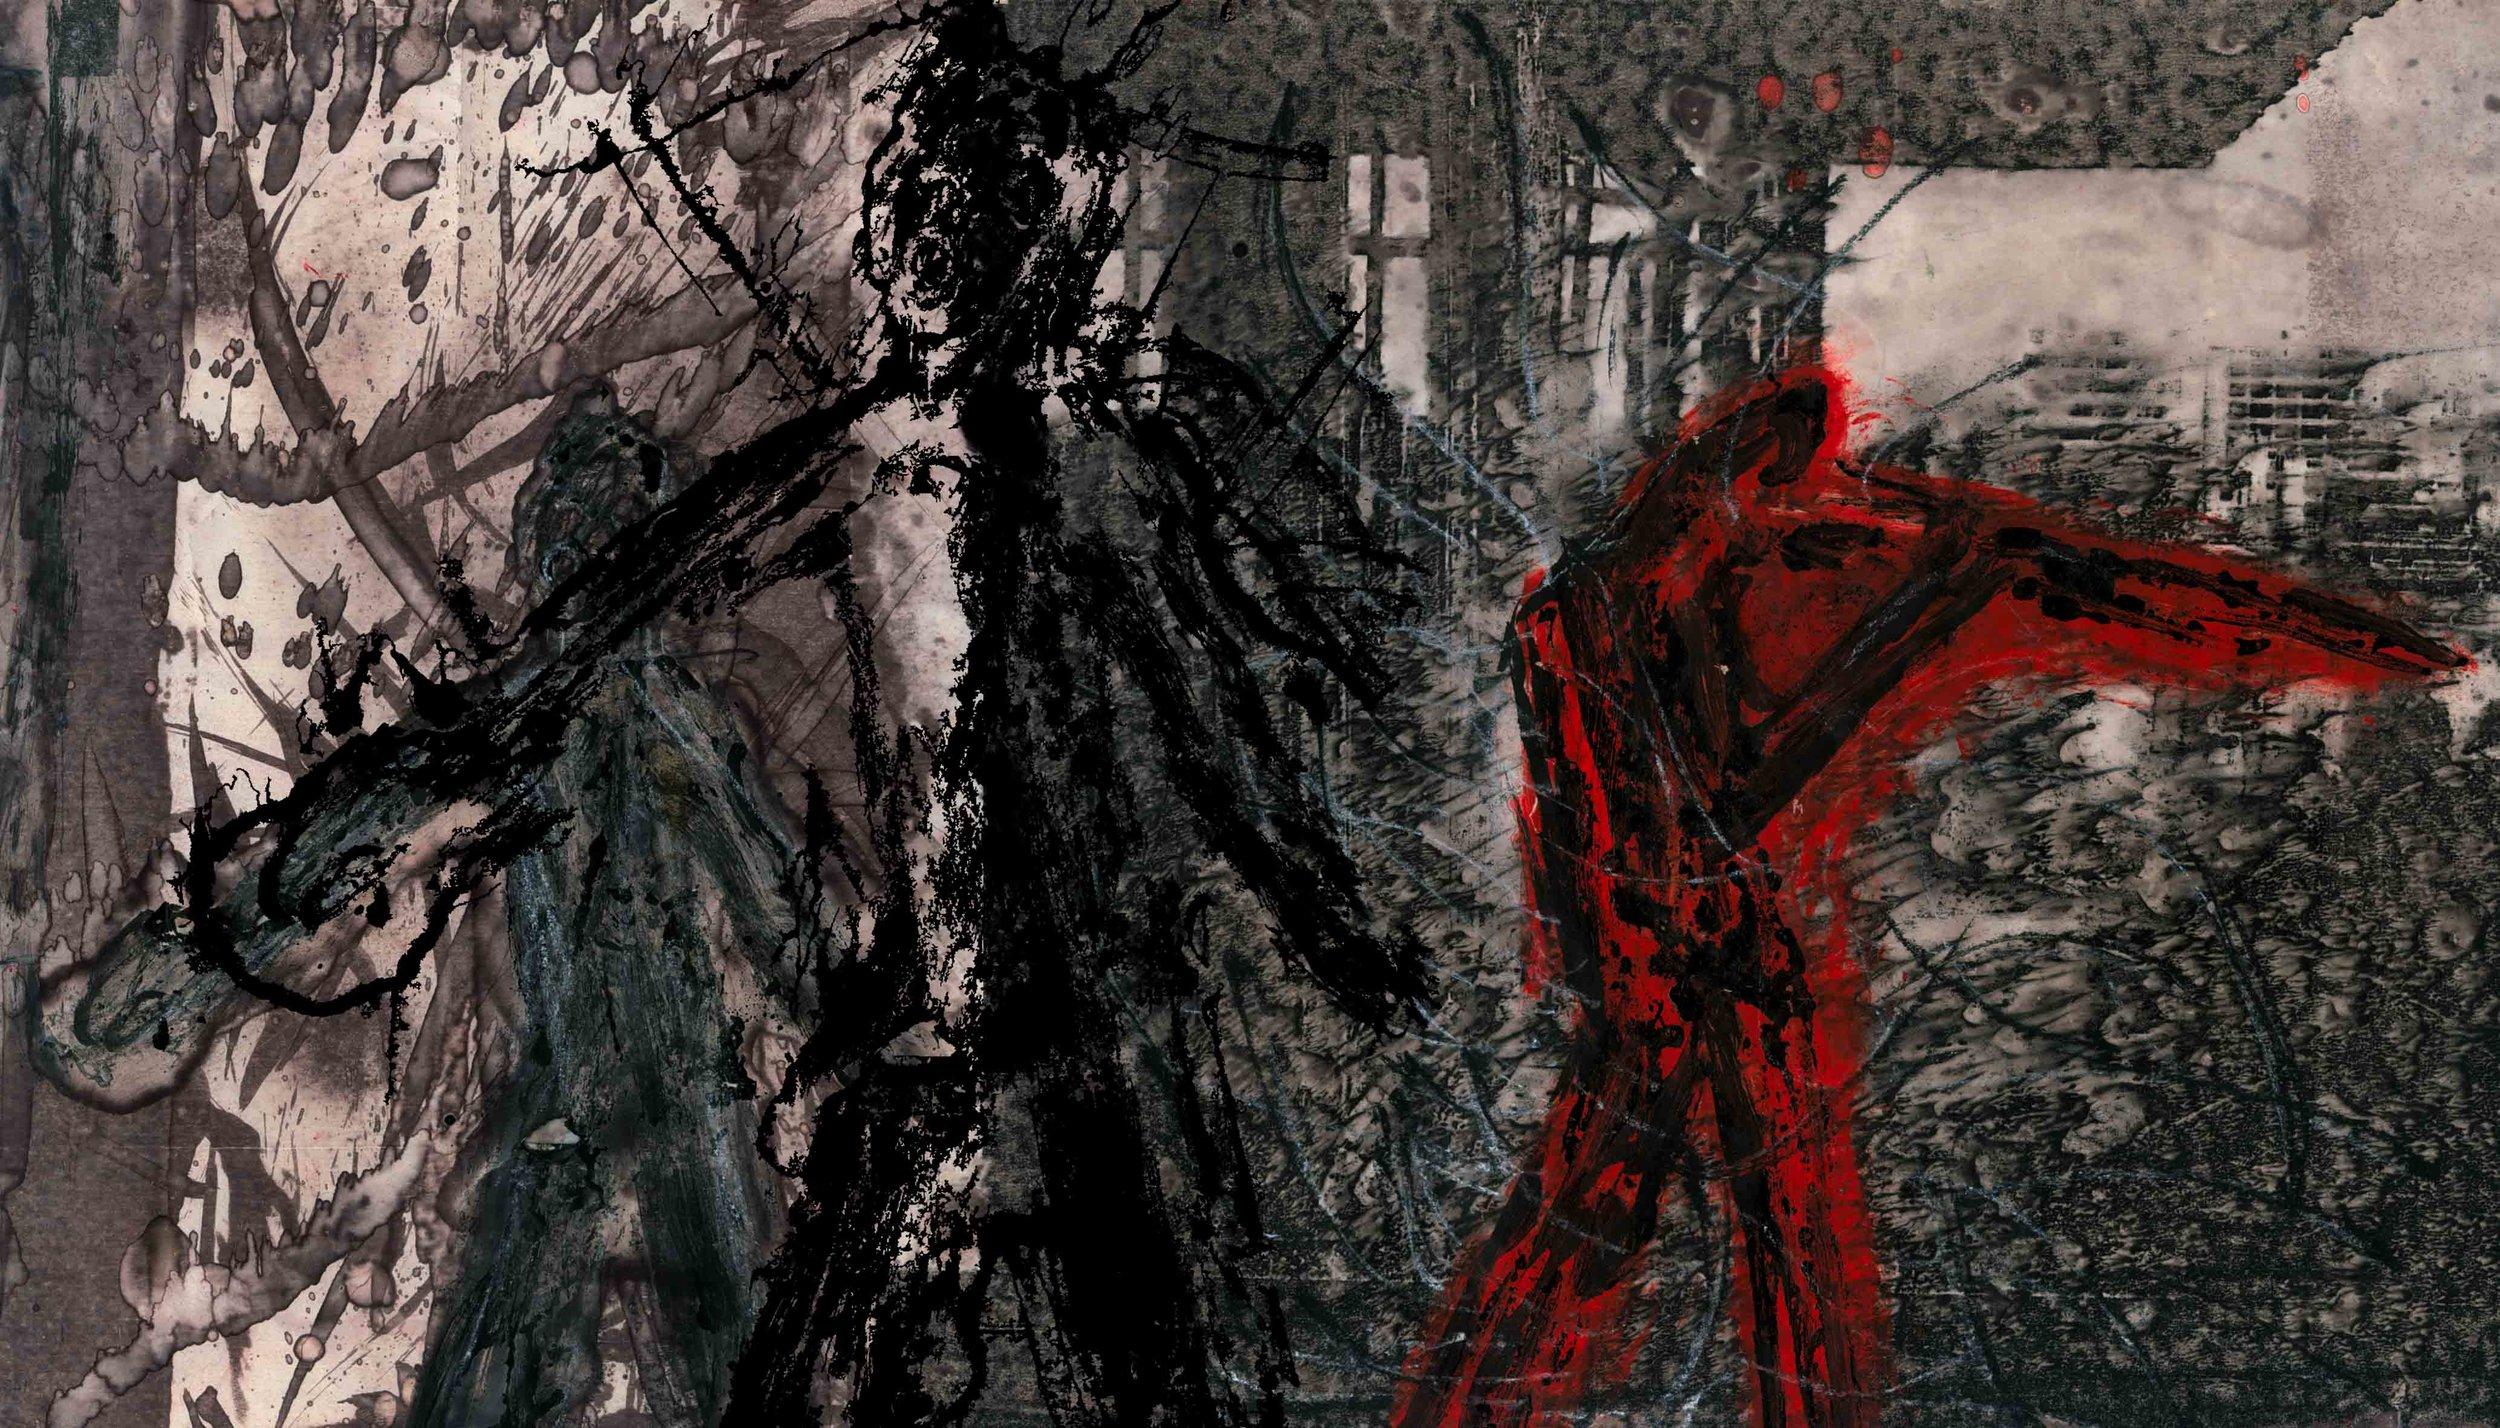 alfred_tarazi_fragments_silent_film_screen_42.jpg